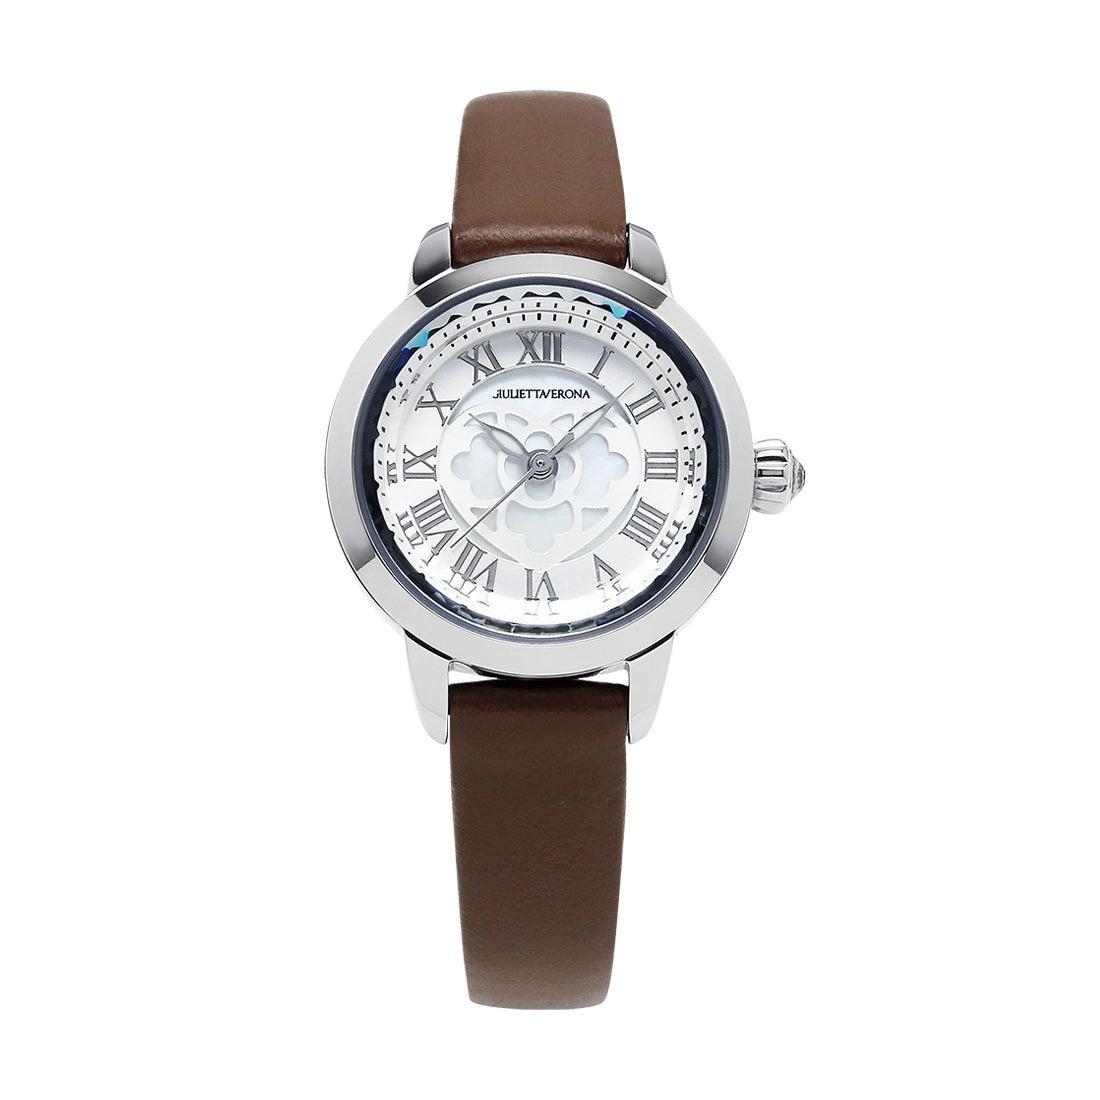 【SAC'S BAR】ジュリエッタヴェローナ GIULIETTAVERONA 腕時計 GV003 LOVE VERONA シルバー×ブラウン